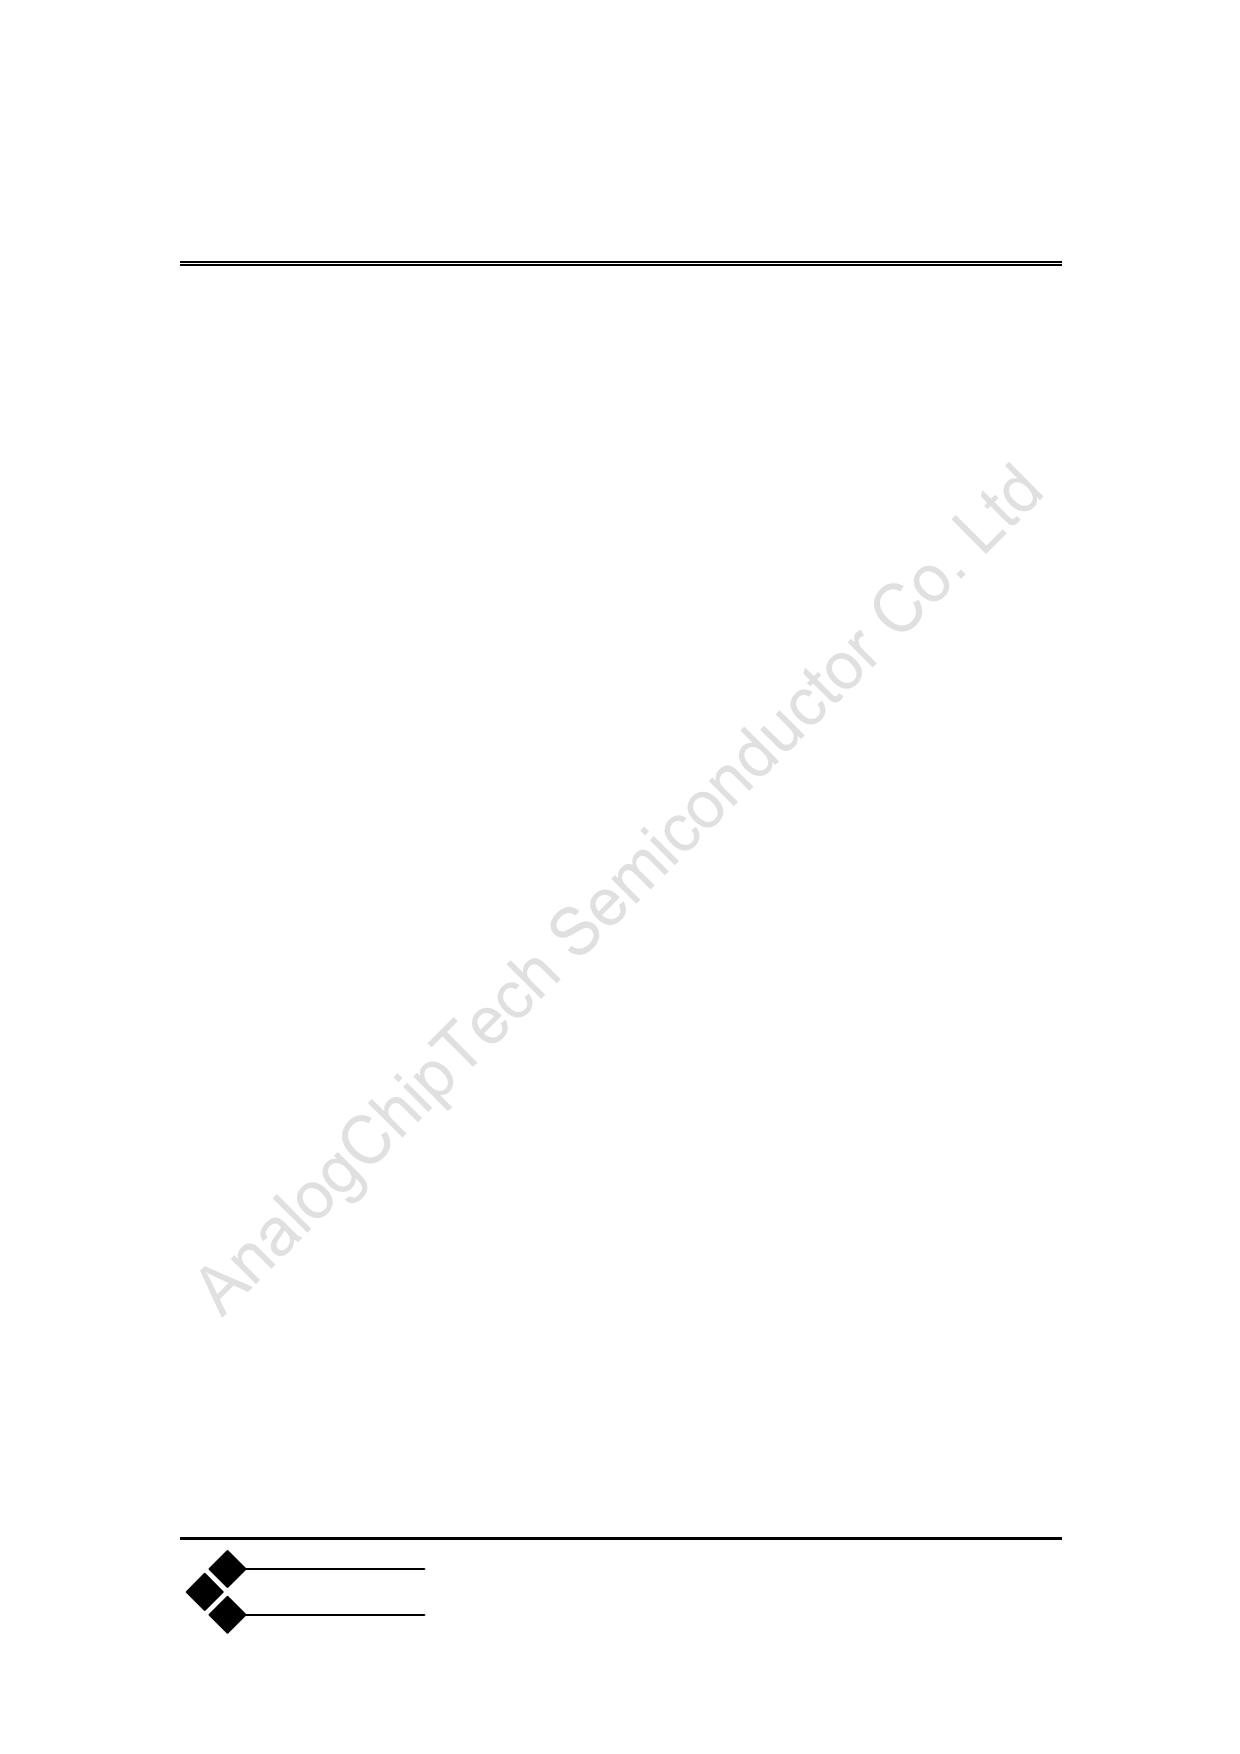 AH8815 datasheet